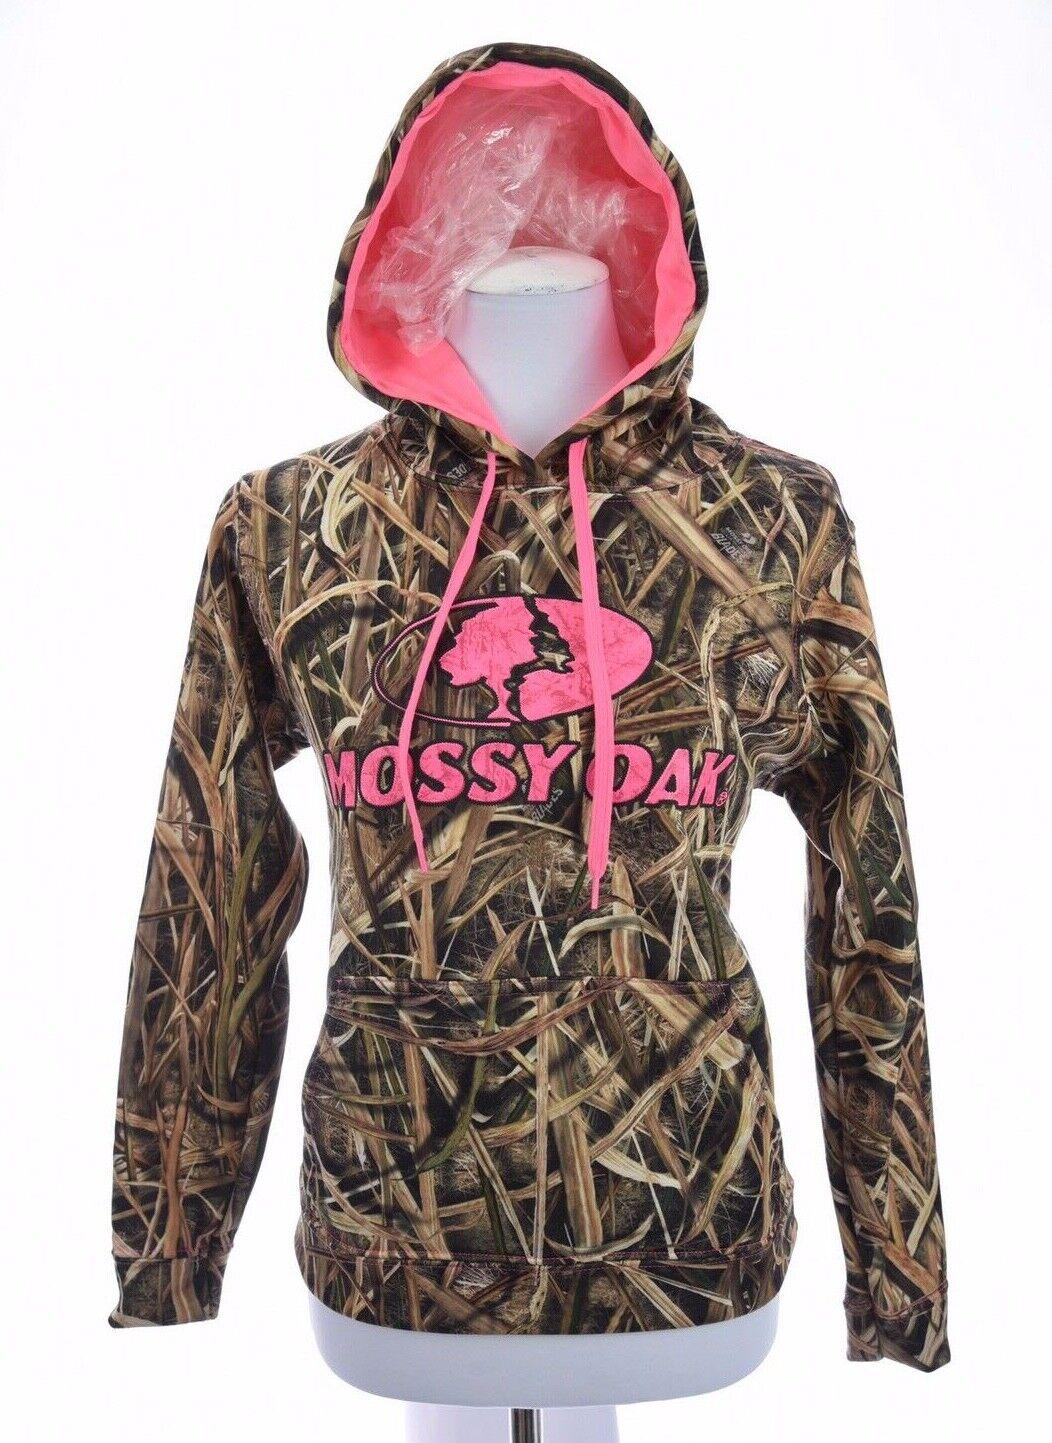 Mossy Oak Womens  Hoodie Sweatshirt Hunting Hot Pink Camouflage Sz Small  latest styles